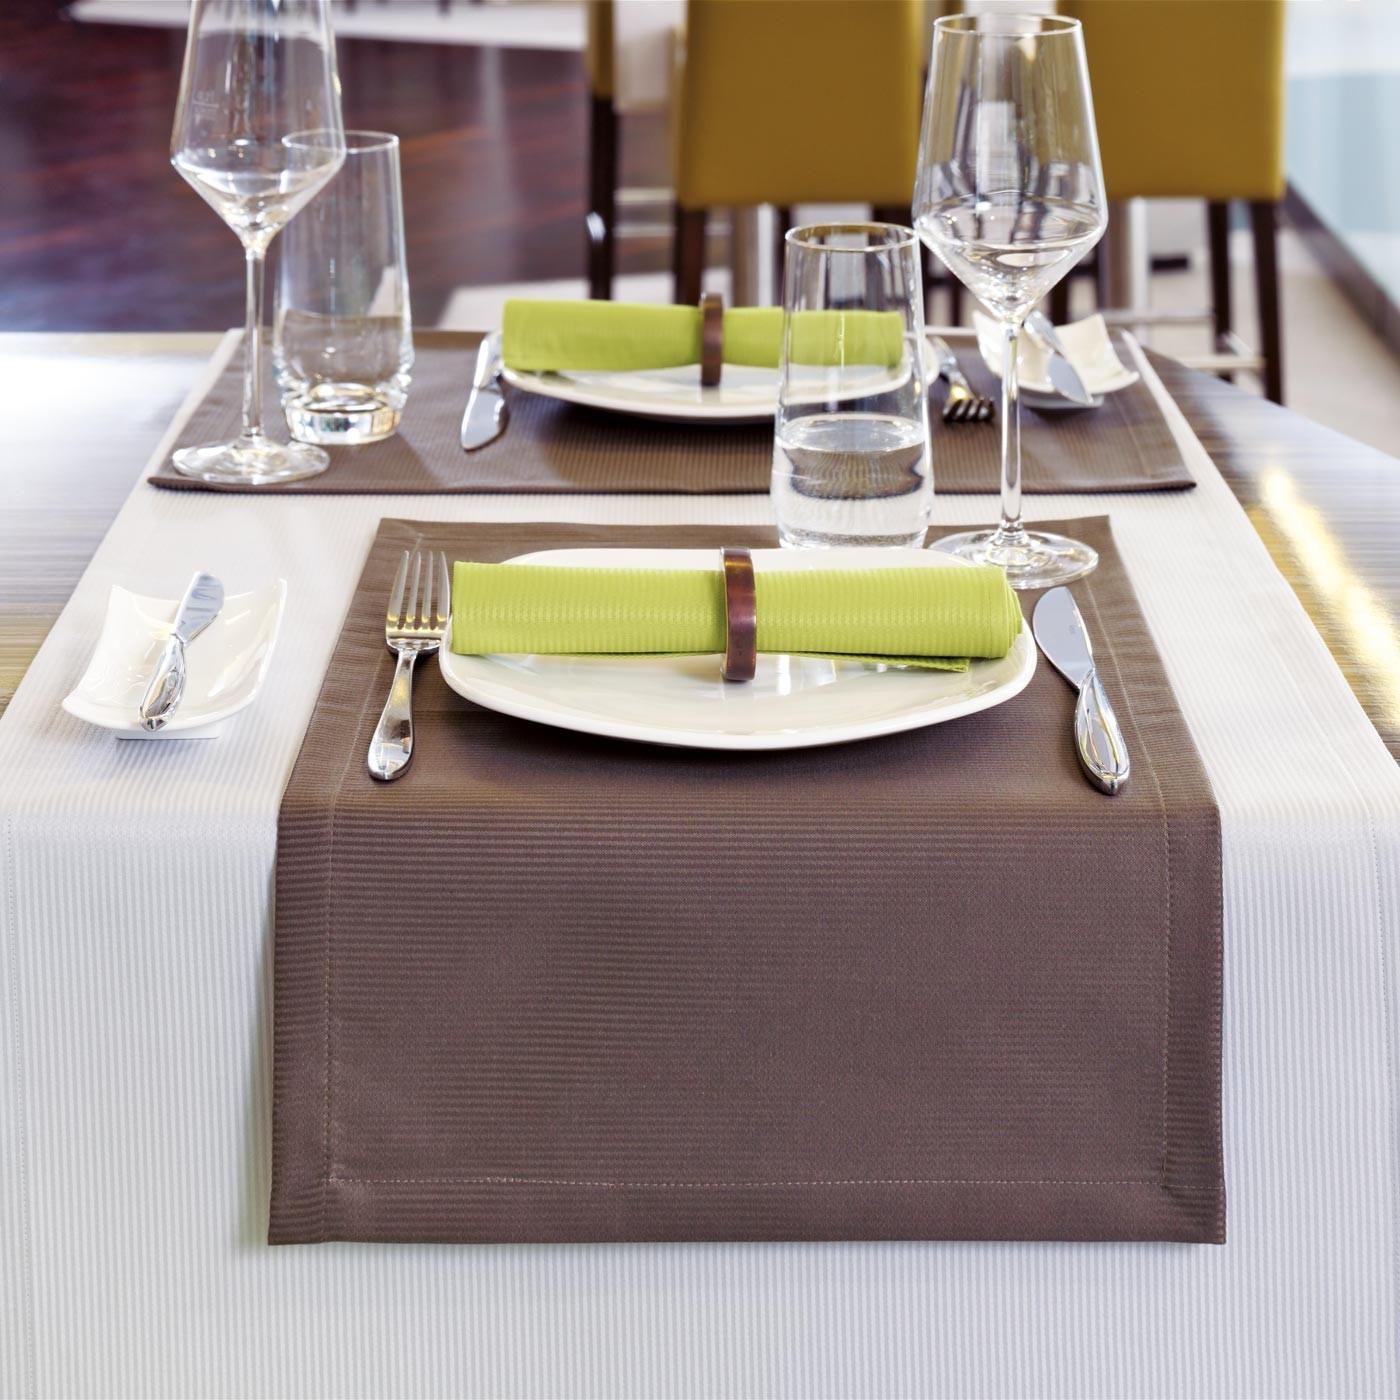 tischsets stoff waschbar beautiful best gesteppte tischsets stoff tischsets zebras zebradekor. Black Bedroom Furniture Sets. Home Design Ideas